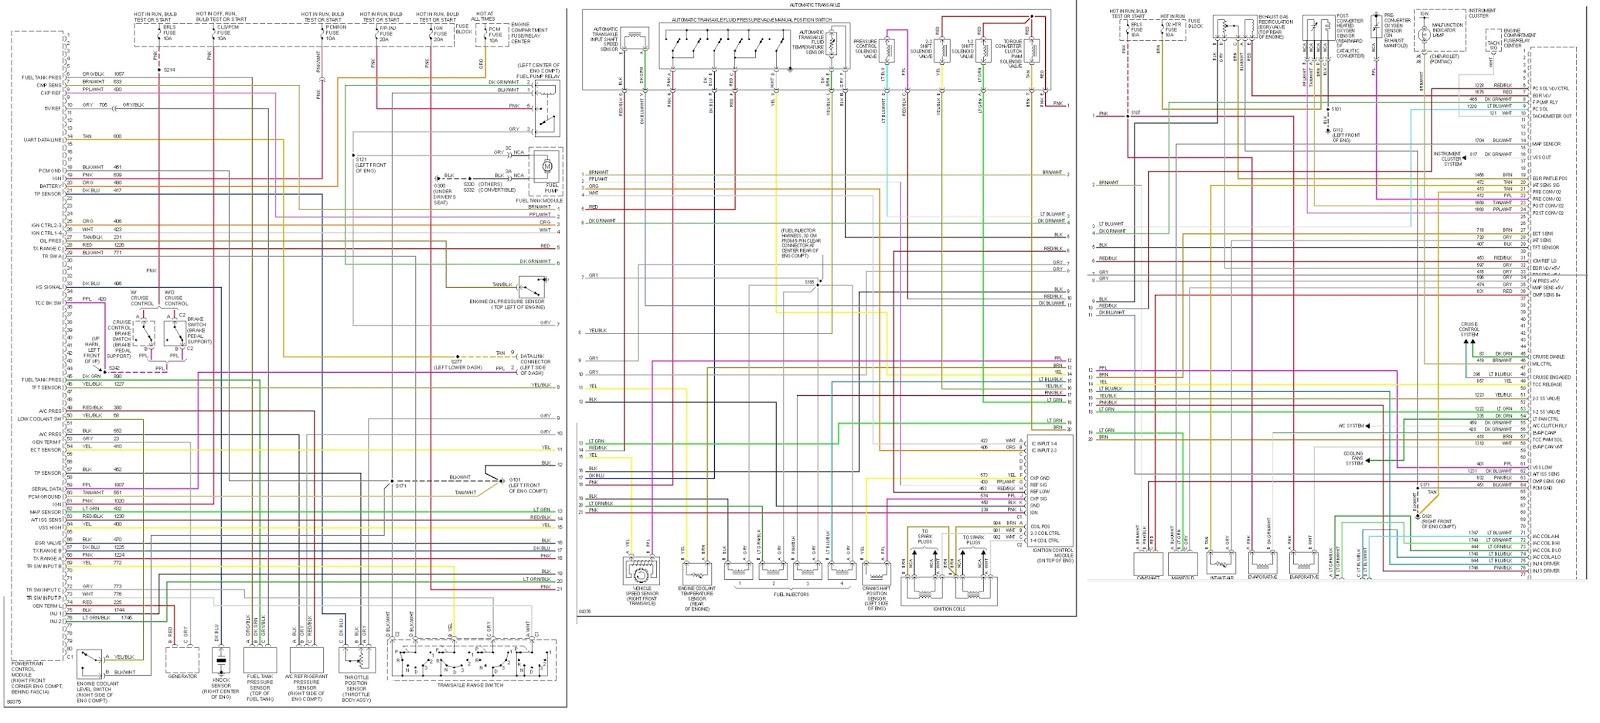 1998 cavalier ignition wiring diagram chevy cavalier wiring harness diagramrh svlc us  [ 1600 x 723 Pixel ]